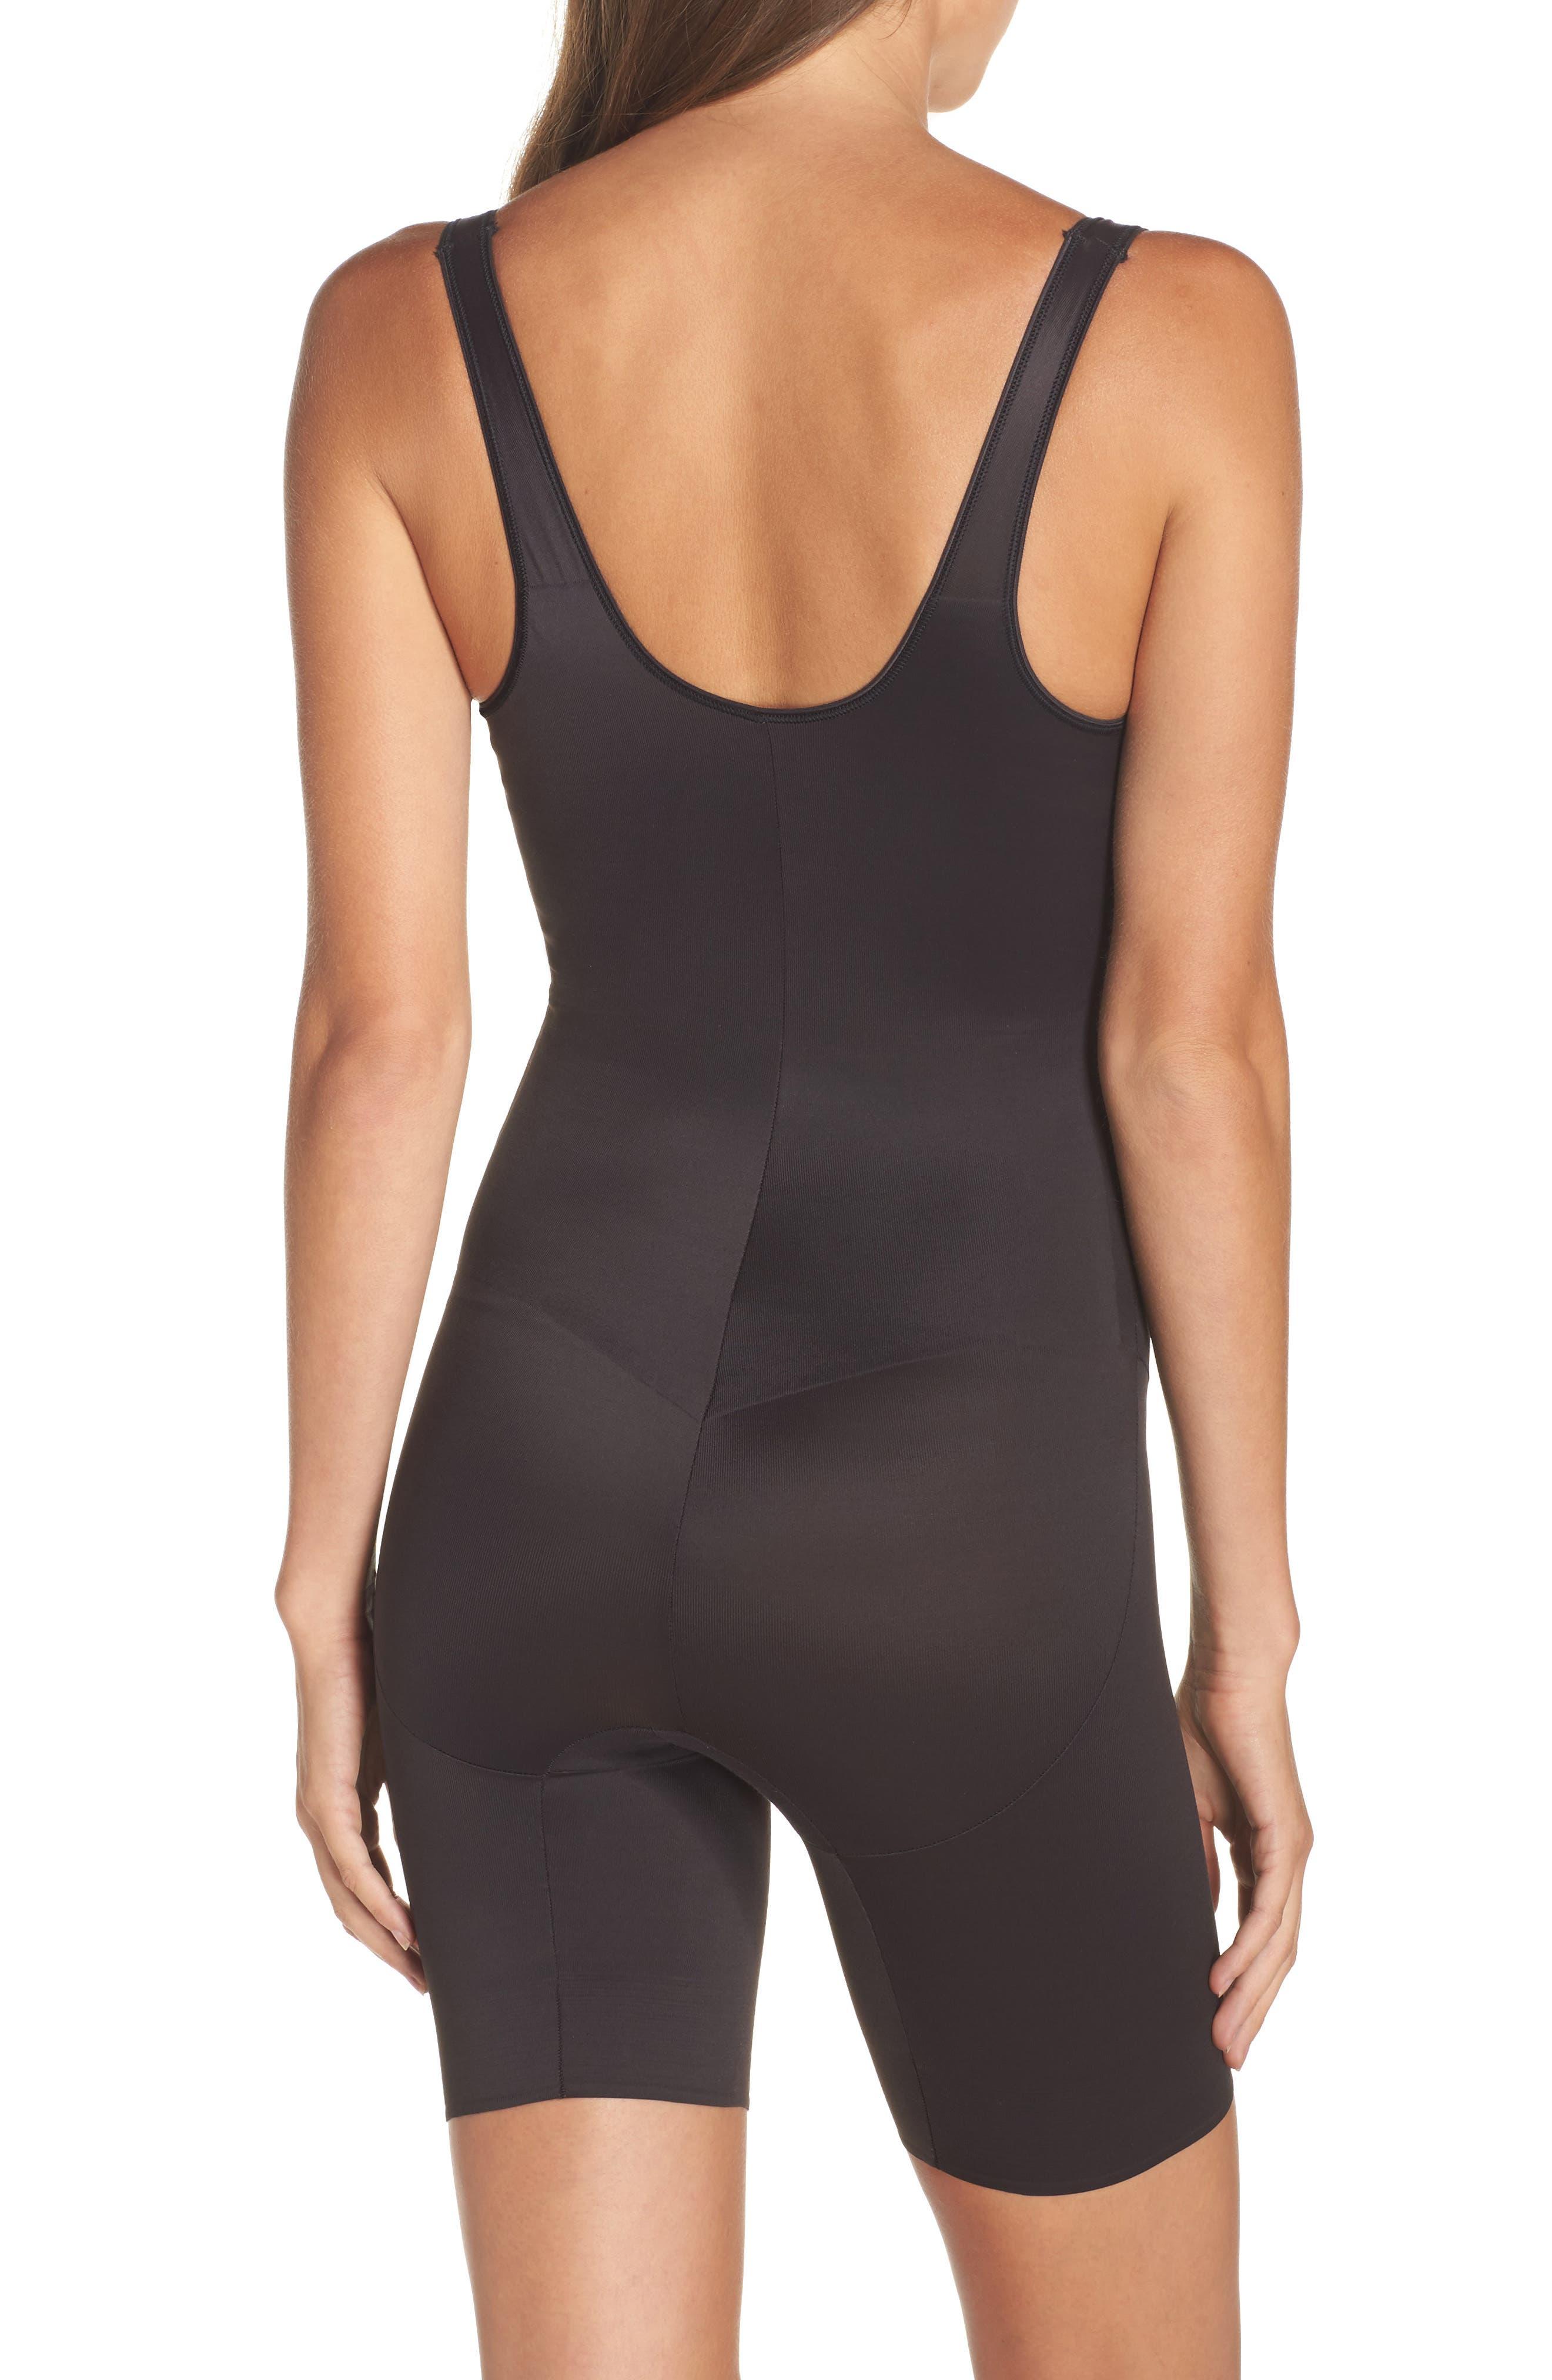 Torsette Underbust Mid Thigh Bodysuit Shaper,                             Alternate thumbnail 3, color,                             BLACK